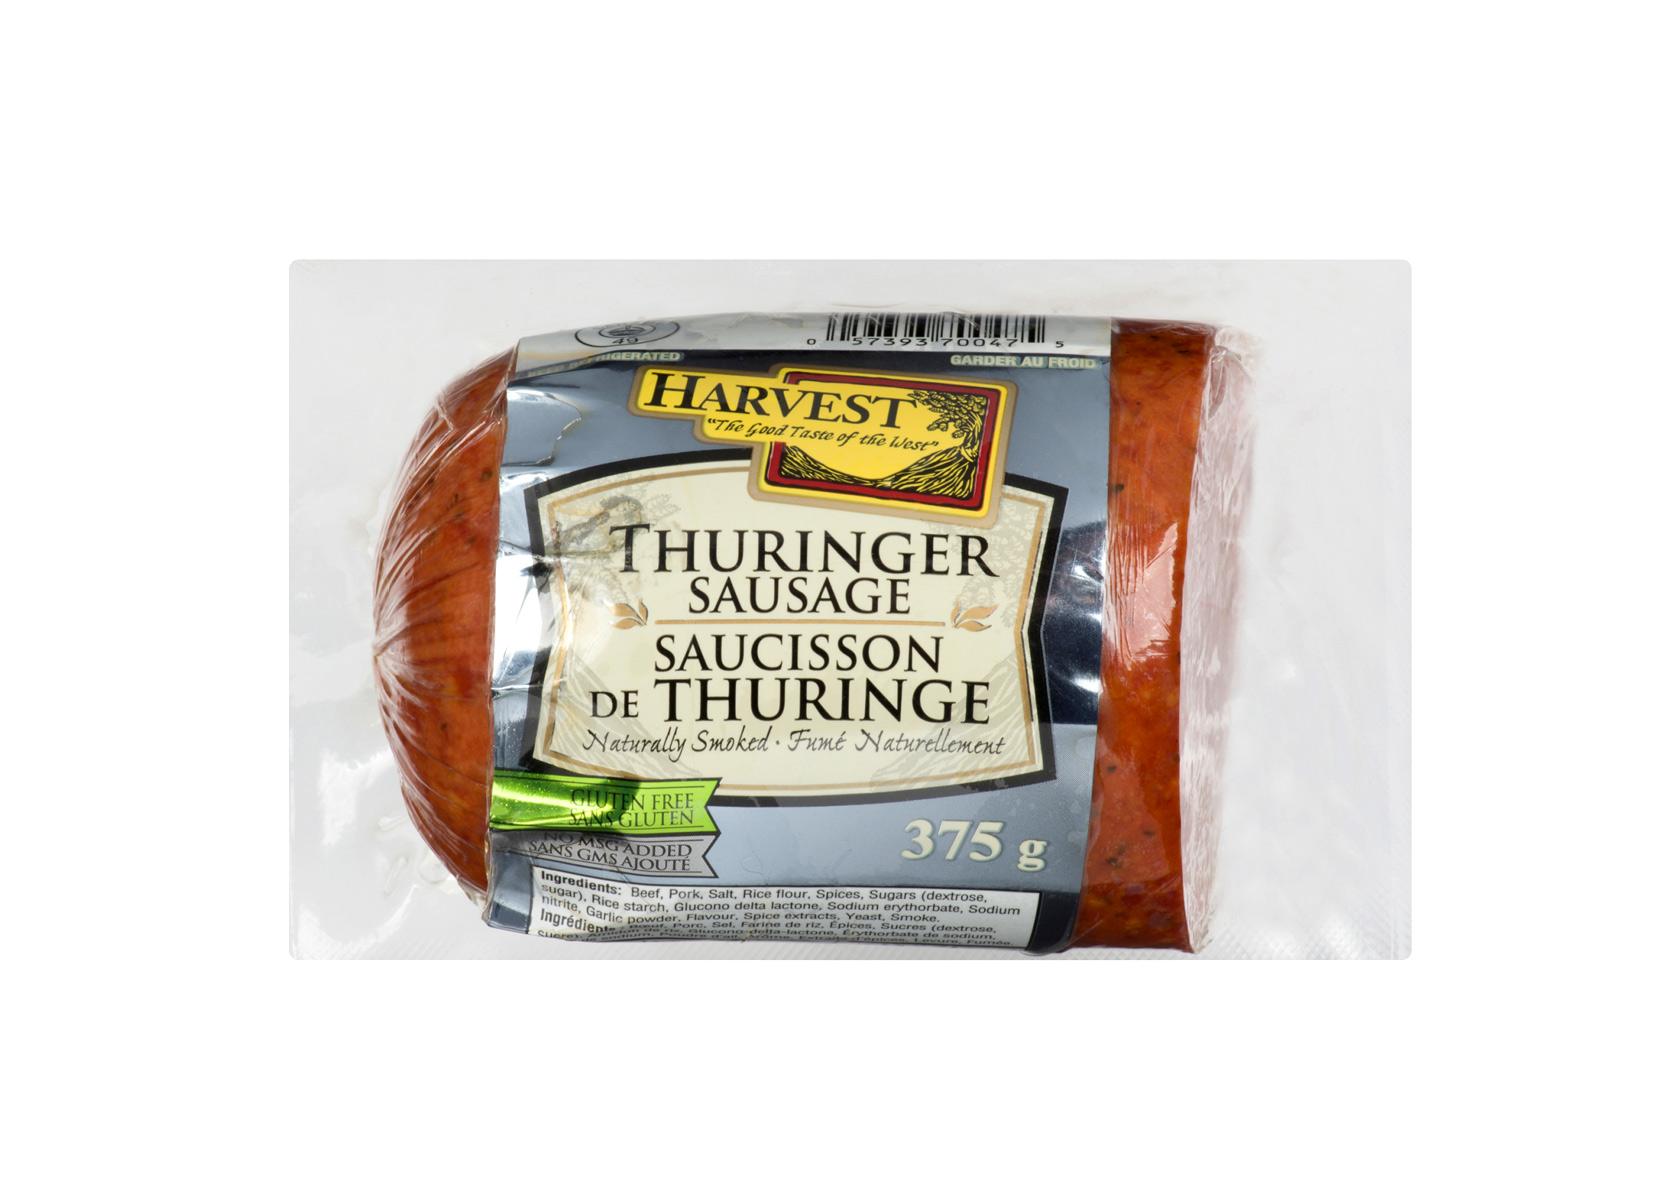 Chub Thuringer Sausage 375g | Harvest Meats